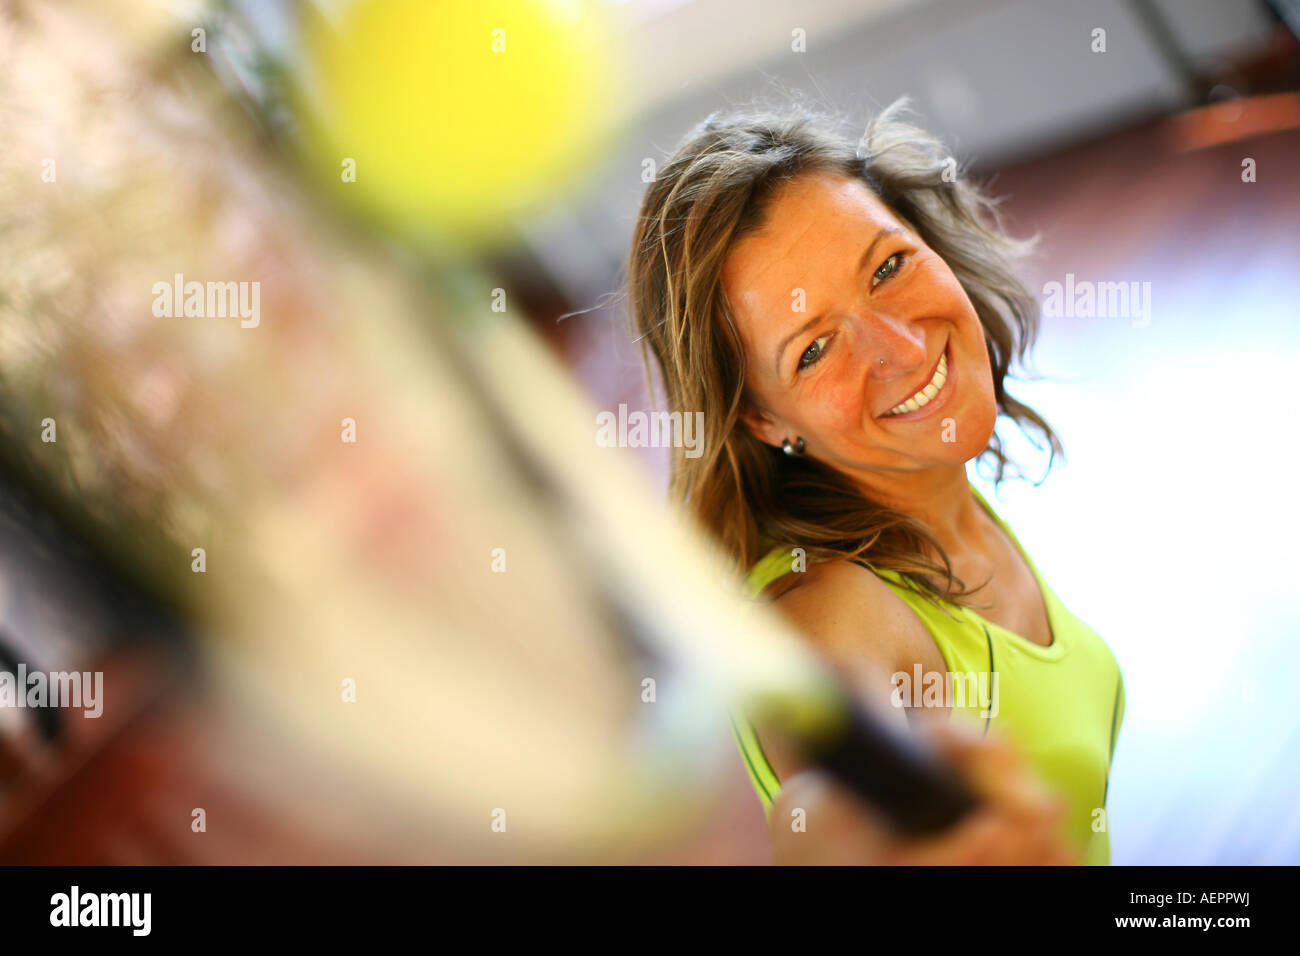 Junge Frau spielt mit Tennisschlaeger und Tennisball , Woman with tennisracket and tennisball - Stock Image